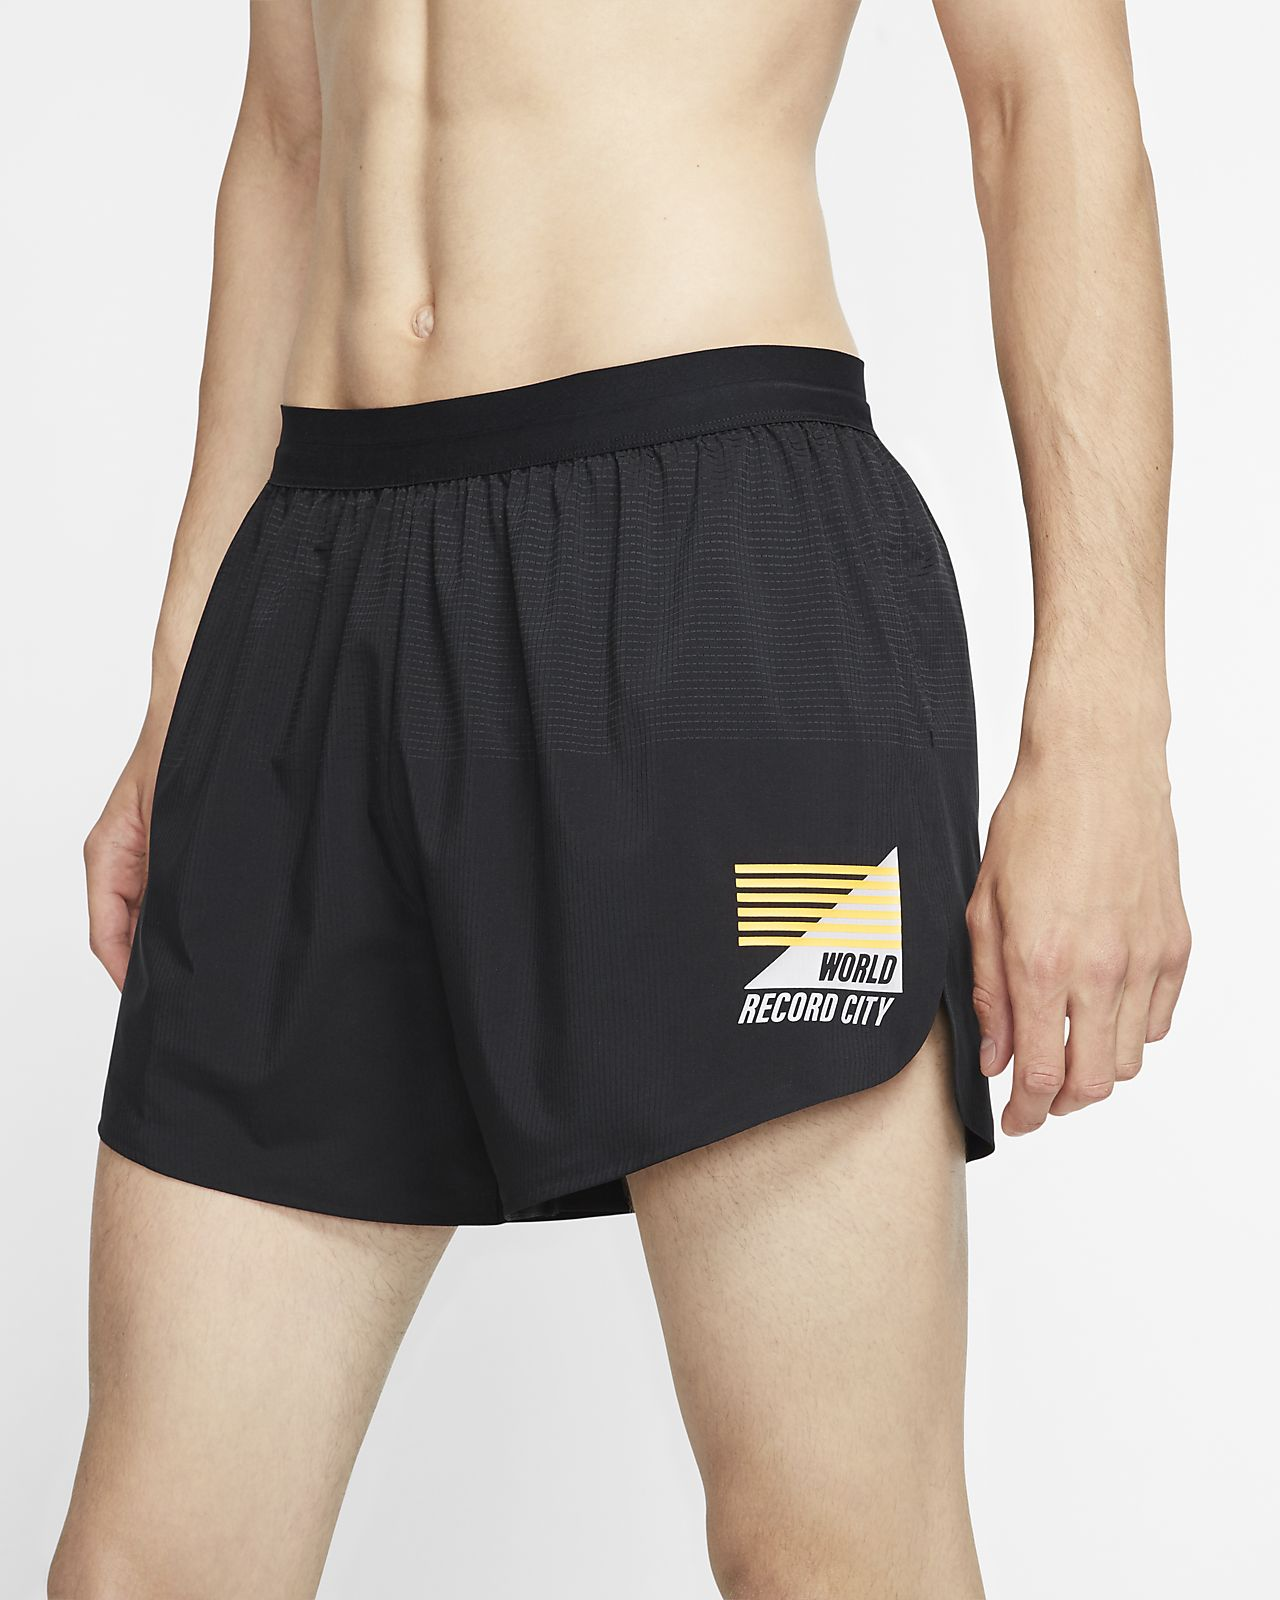 Calções de running sem forro de 10 cm Nike VaporKnit Berlin